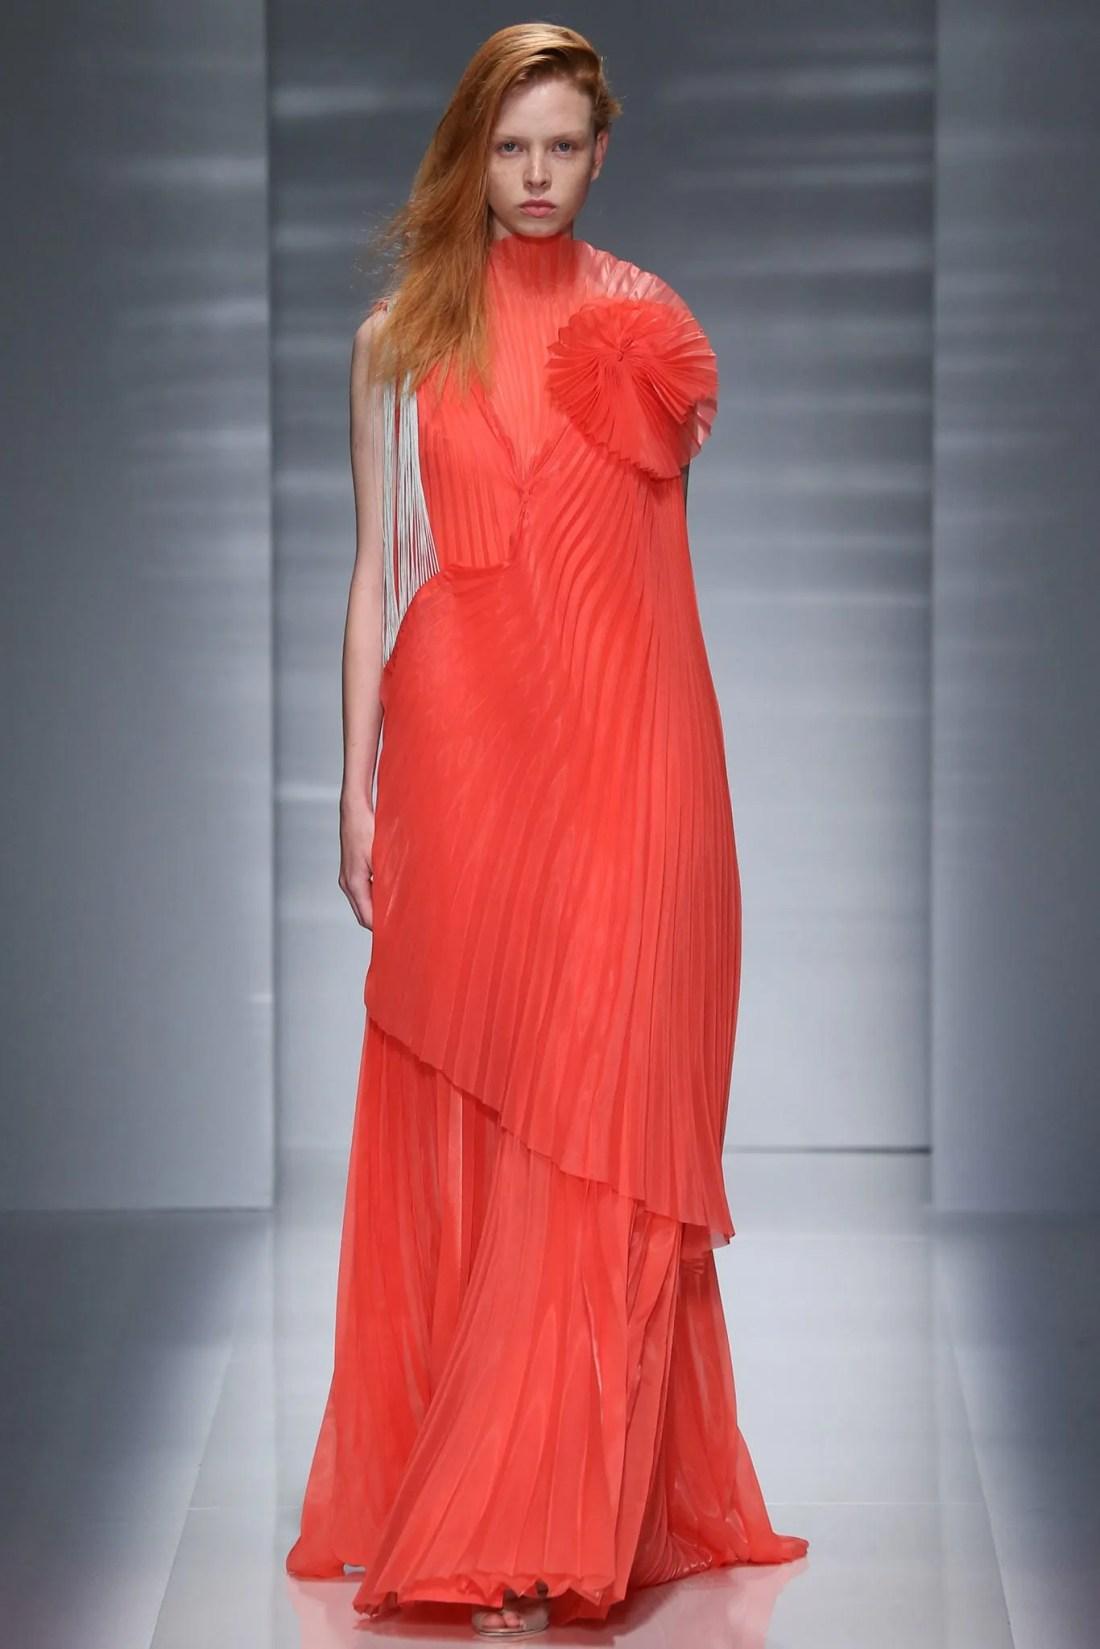 Vionet Couture